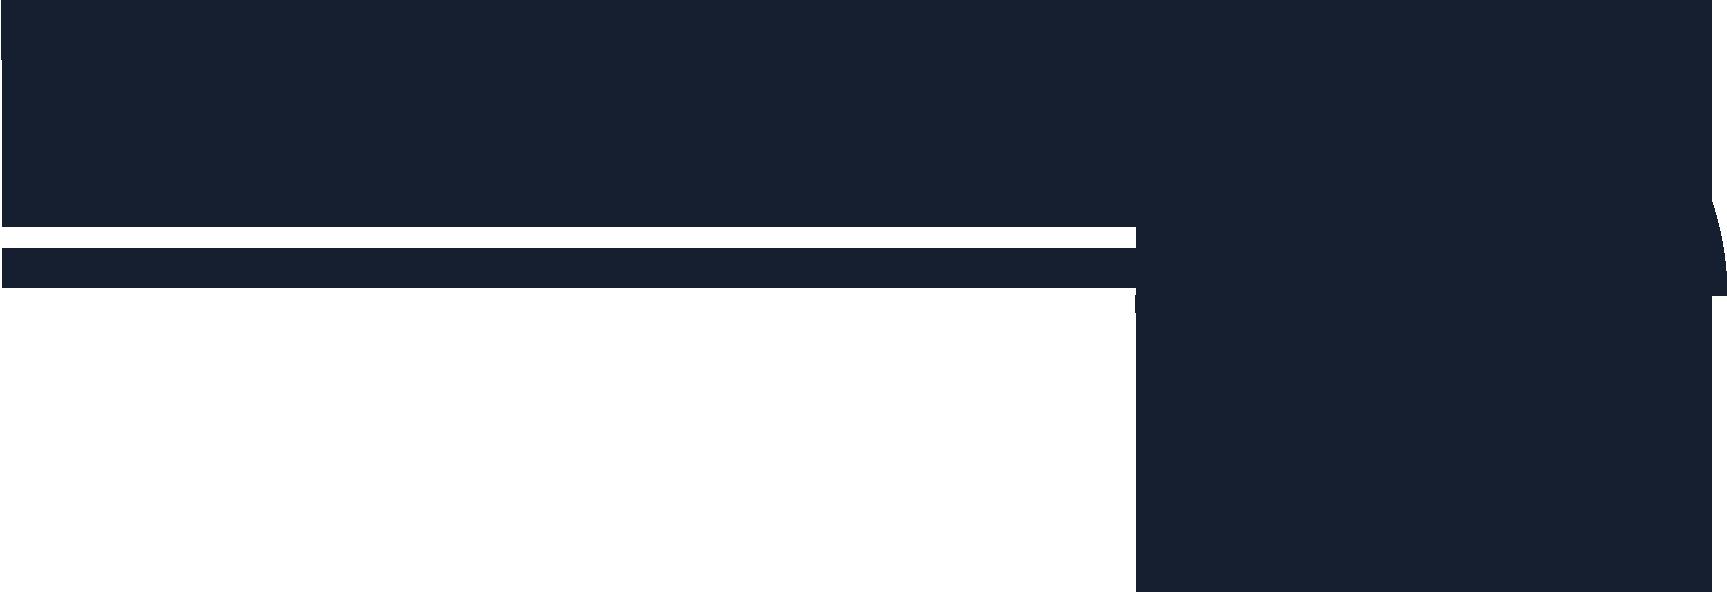 intevi-logo-original.png